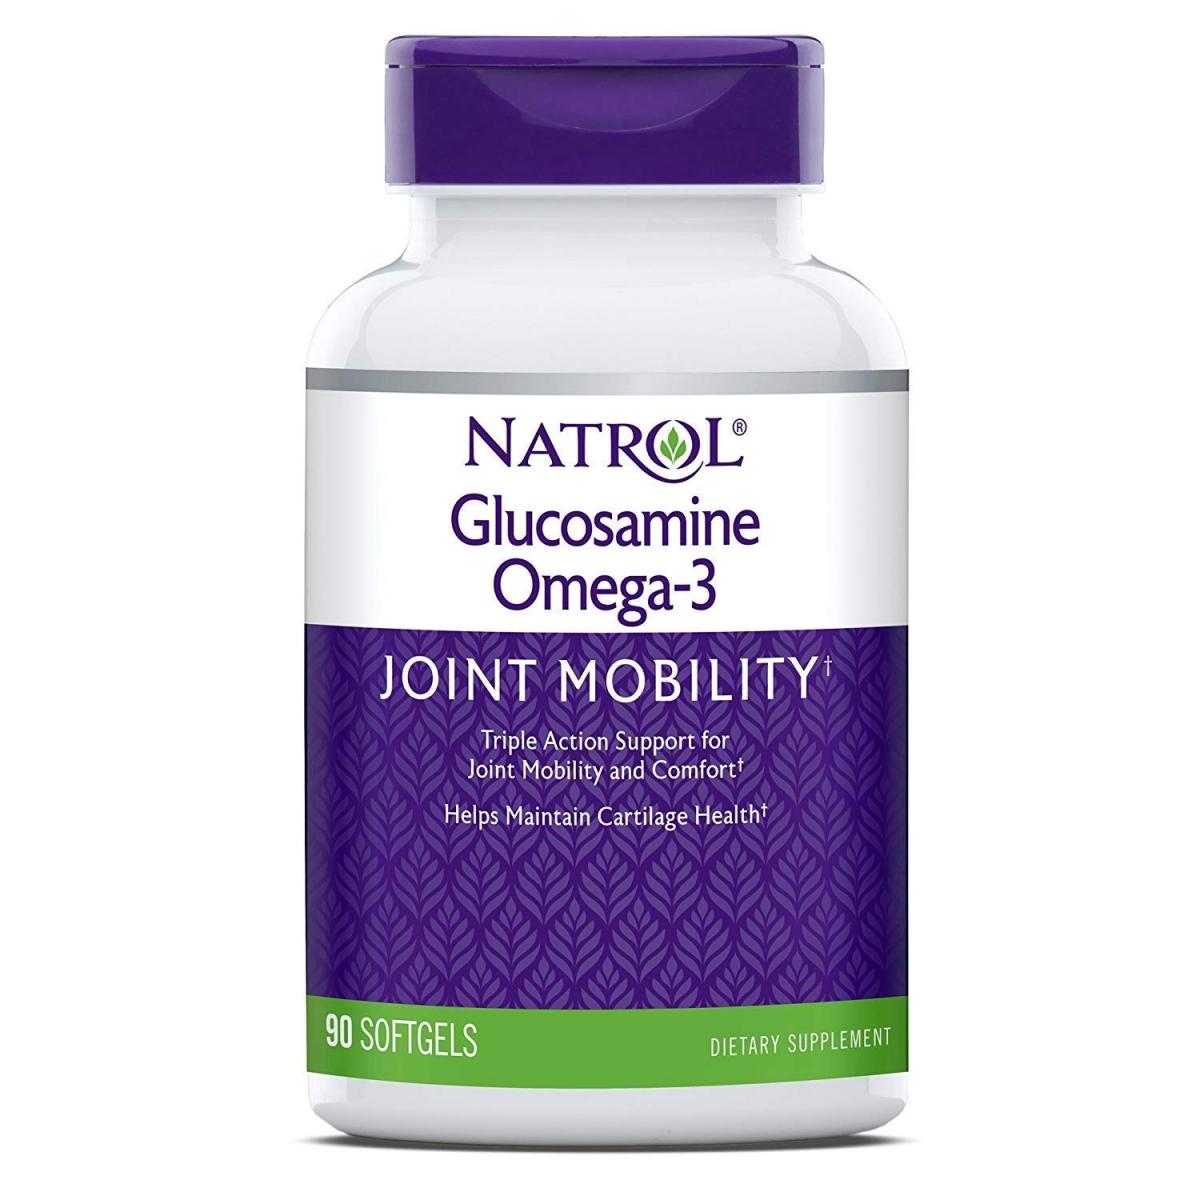 Natrol Glucosamine Omega-3